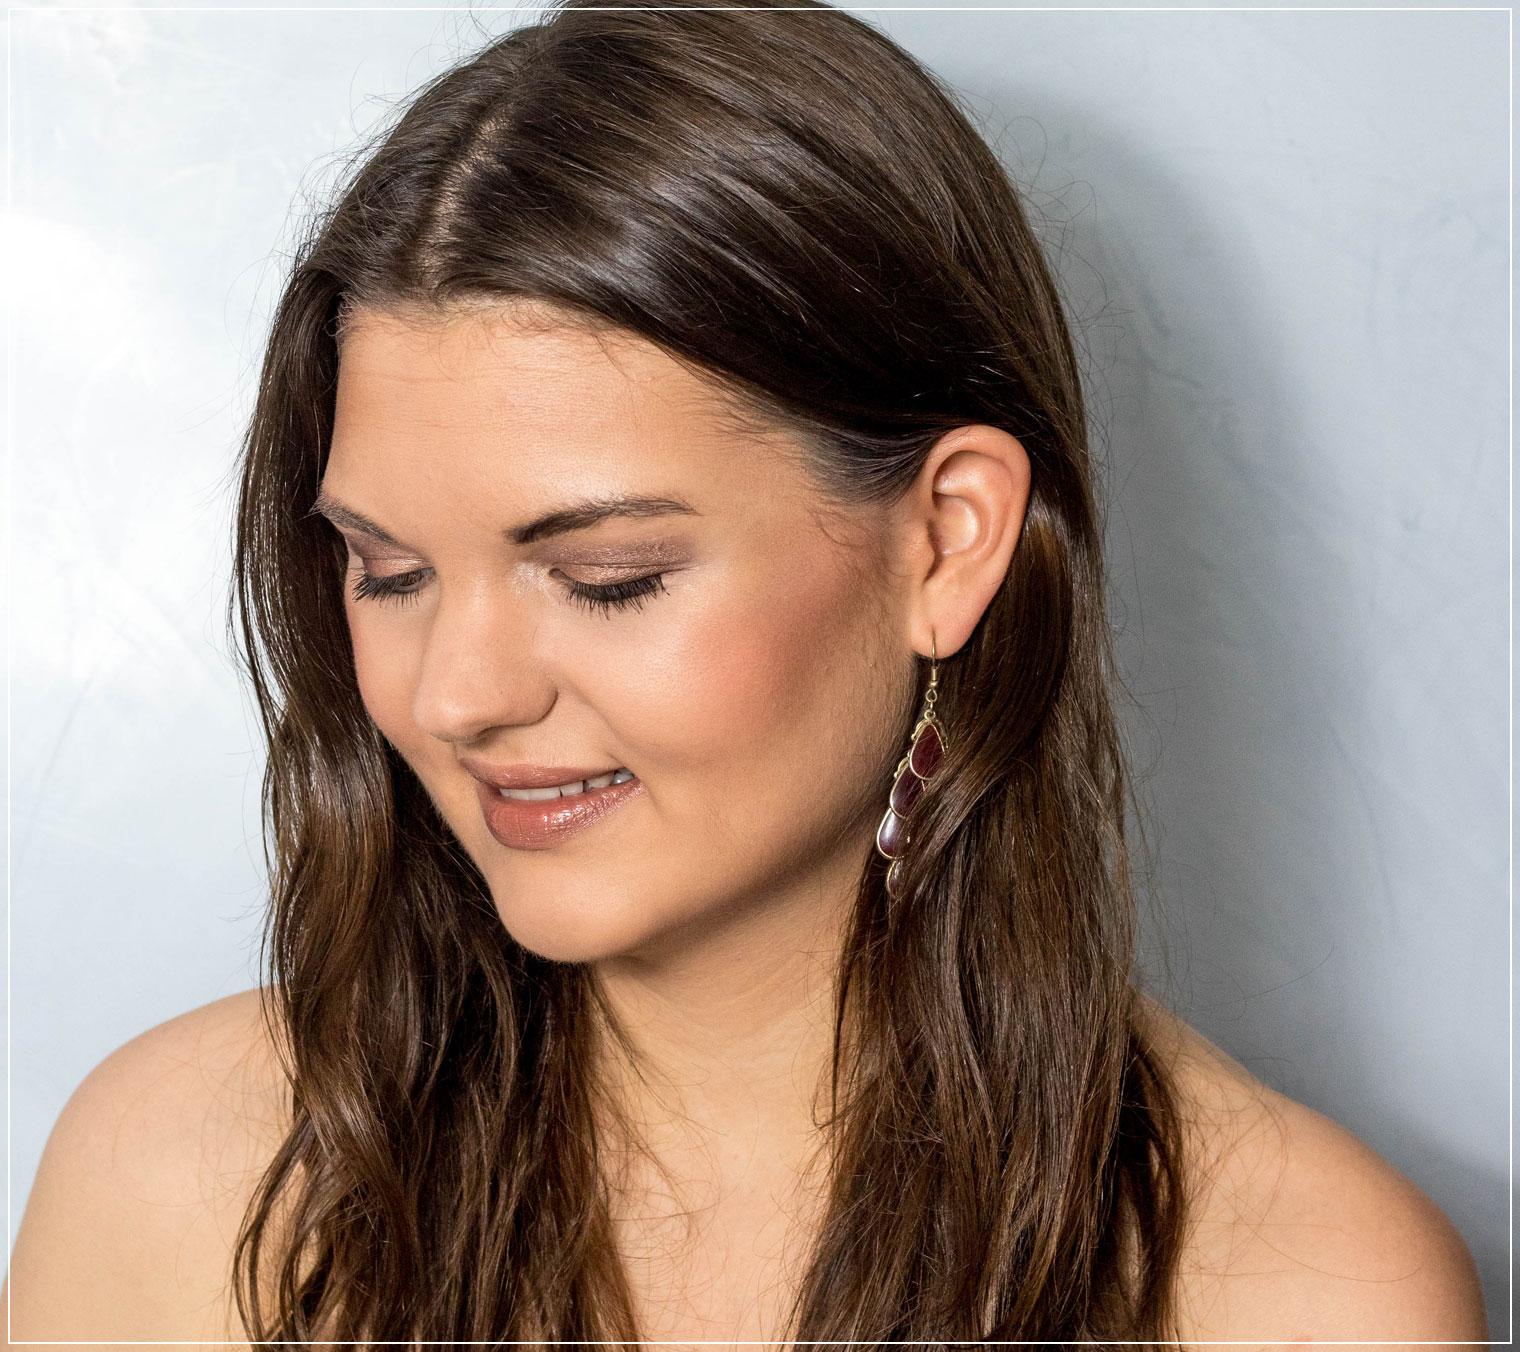 Metallic-Make-Up, Tagesmake-up, Zoeva Palette, Roségoldenes Make-Up, Beautytutorial, Make-up Tutorial, Beauty Blog, Beautybloggerin, Ruhrgebiet